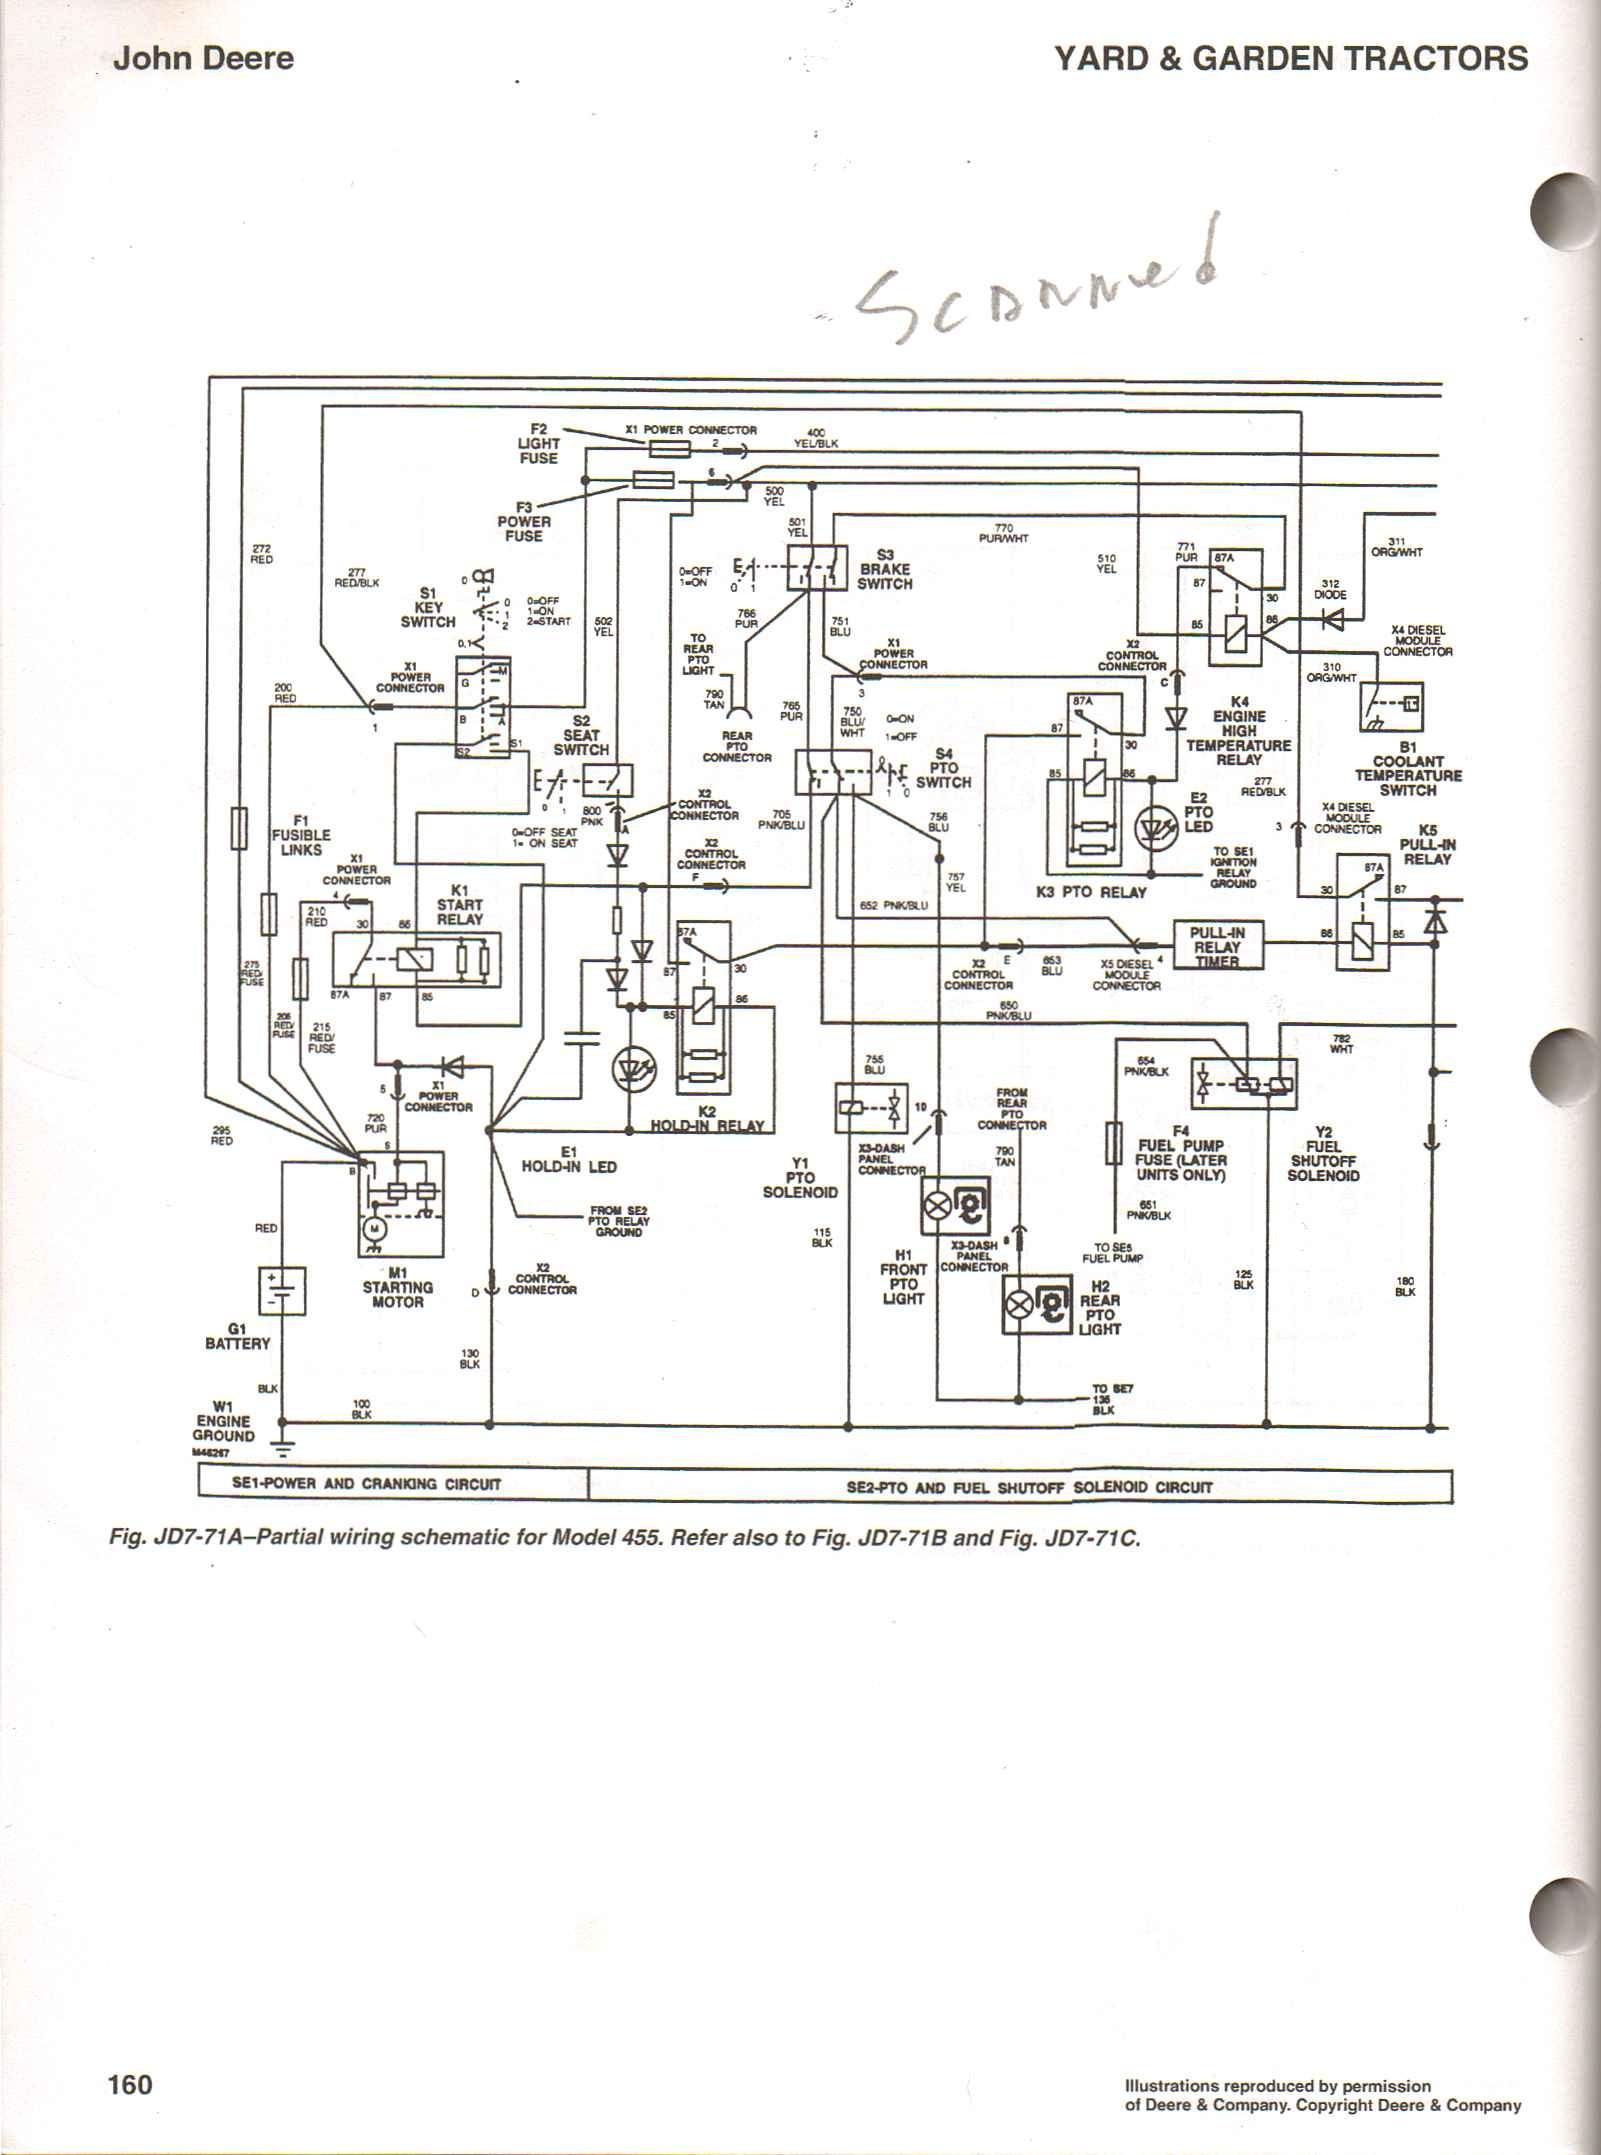 john deere 4450 tractor wiring schematic john deere 265 wiring rh banyan palace com